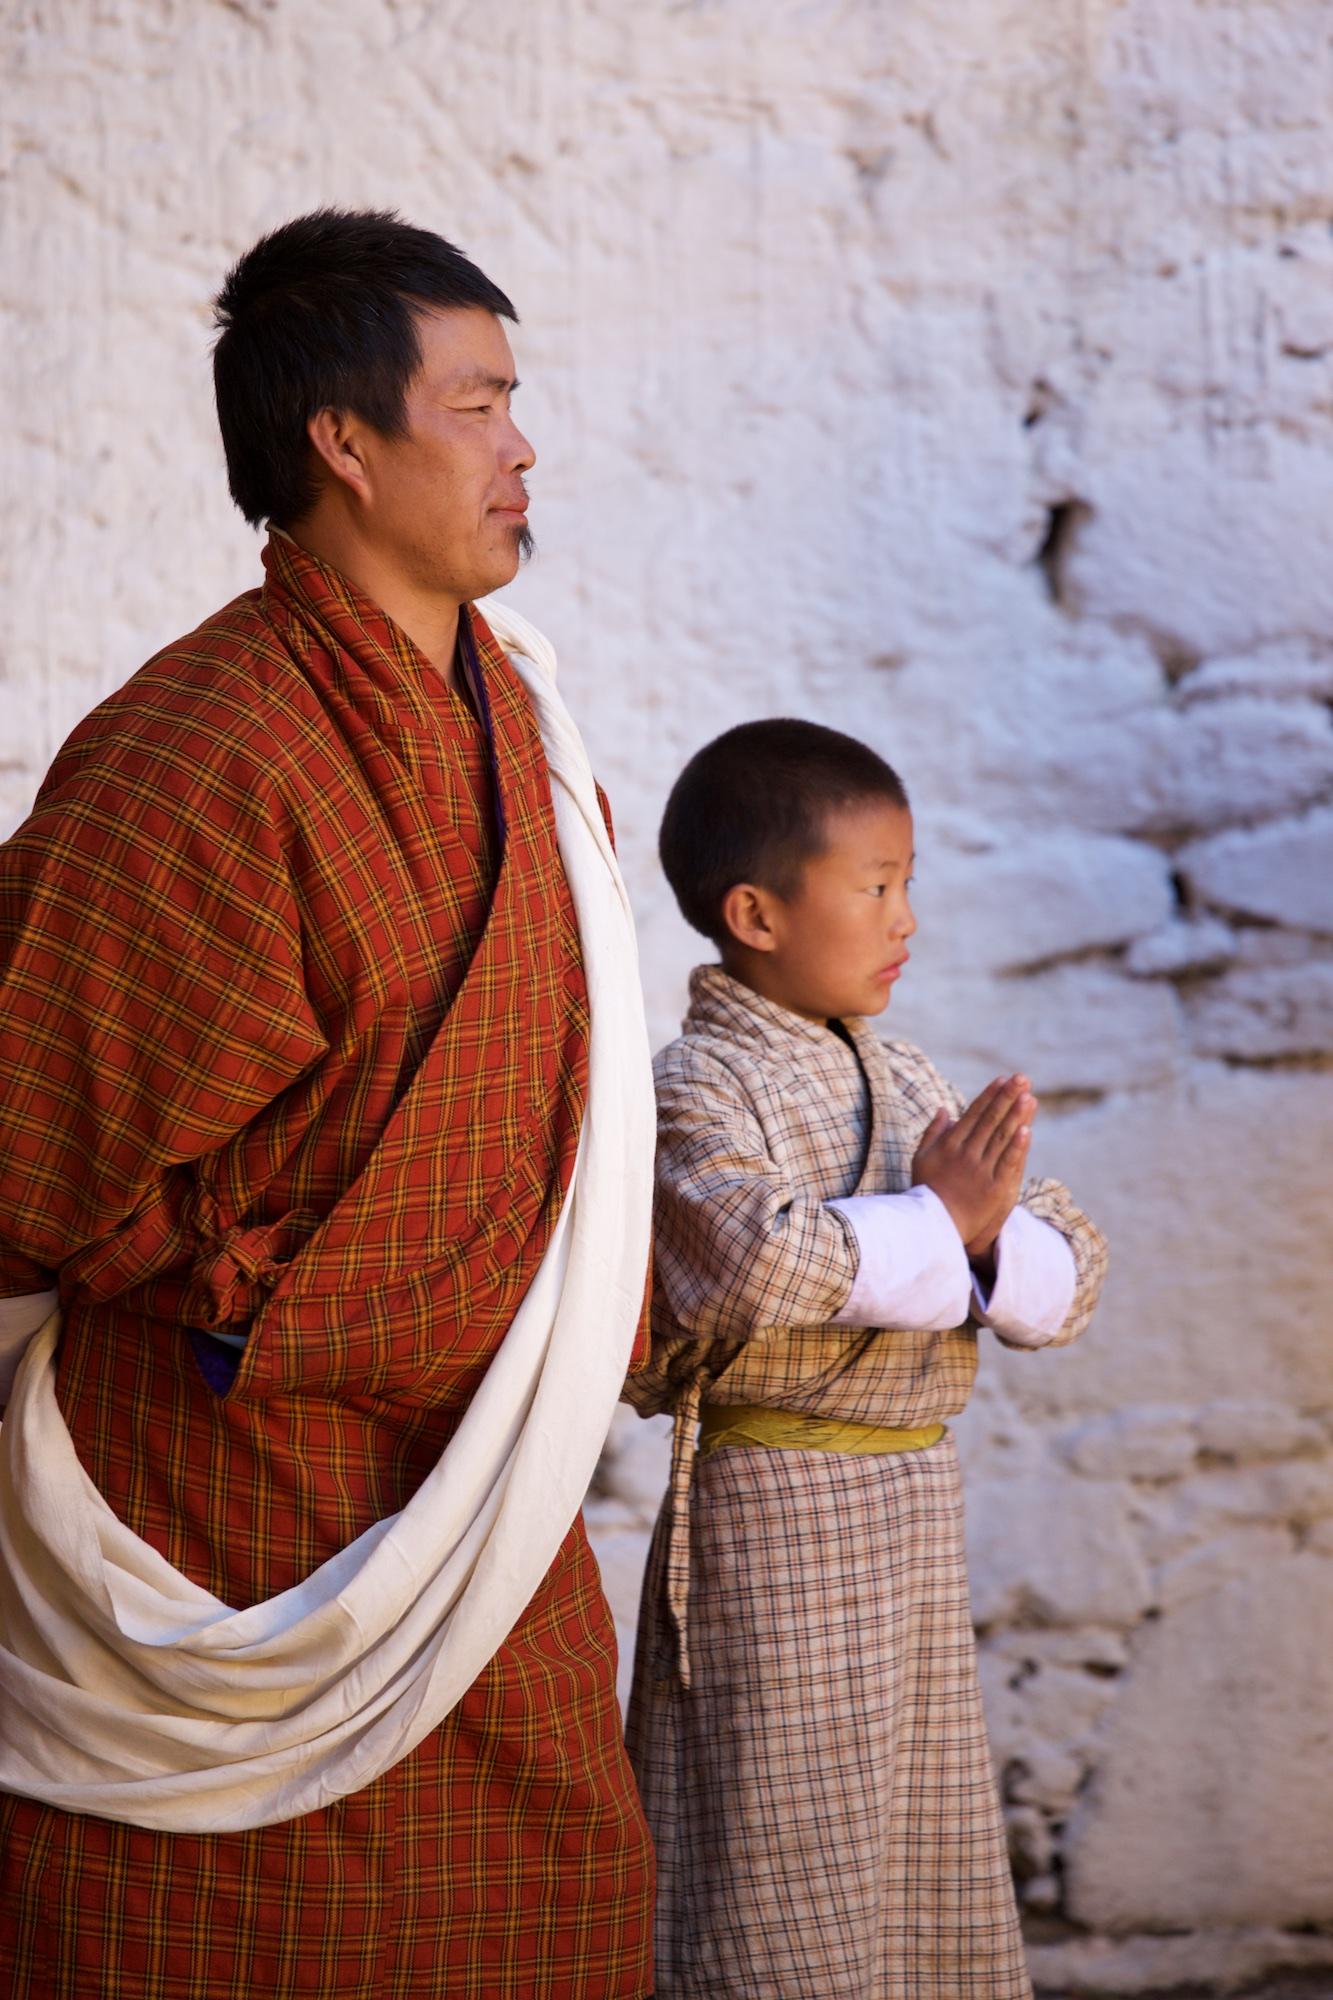 Bhutan-2016- C26O9153.jpg